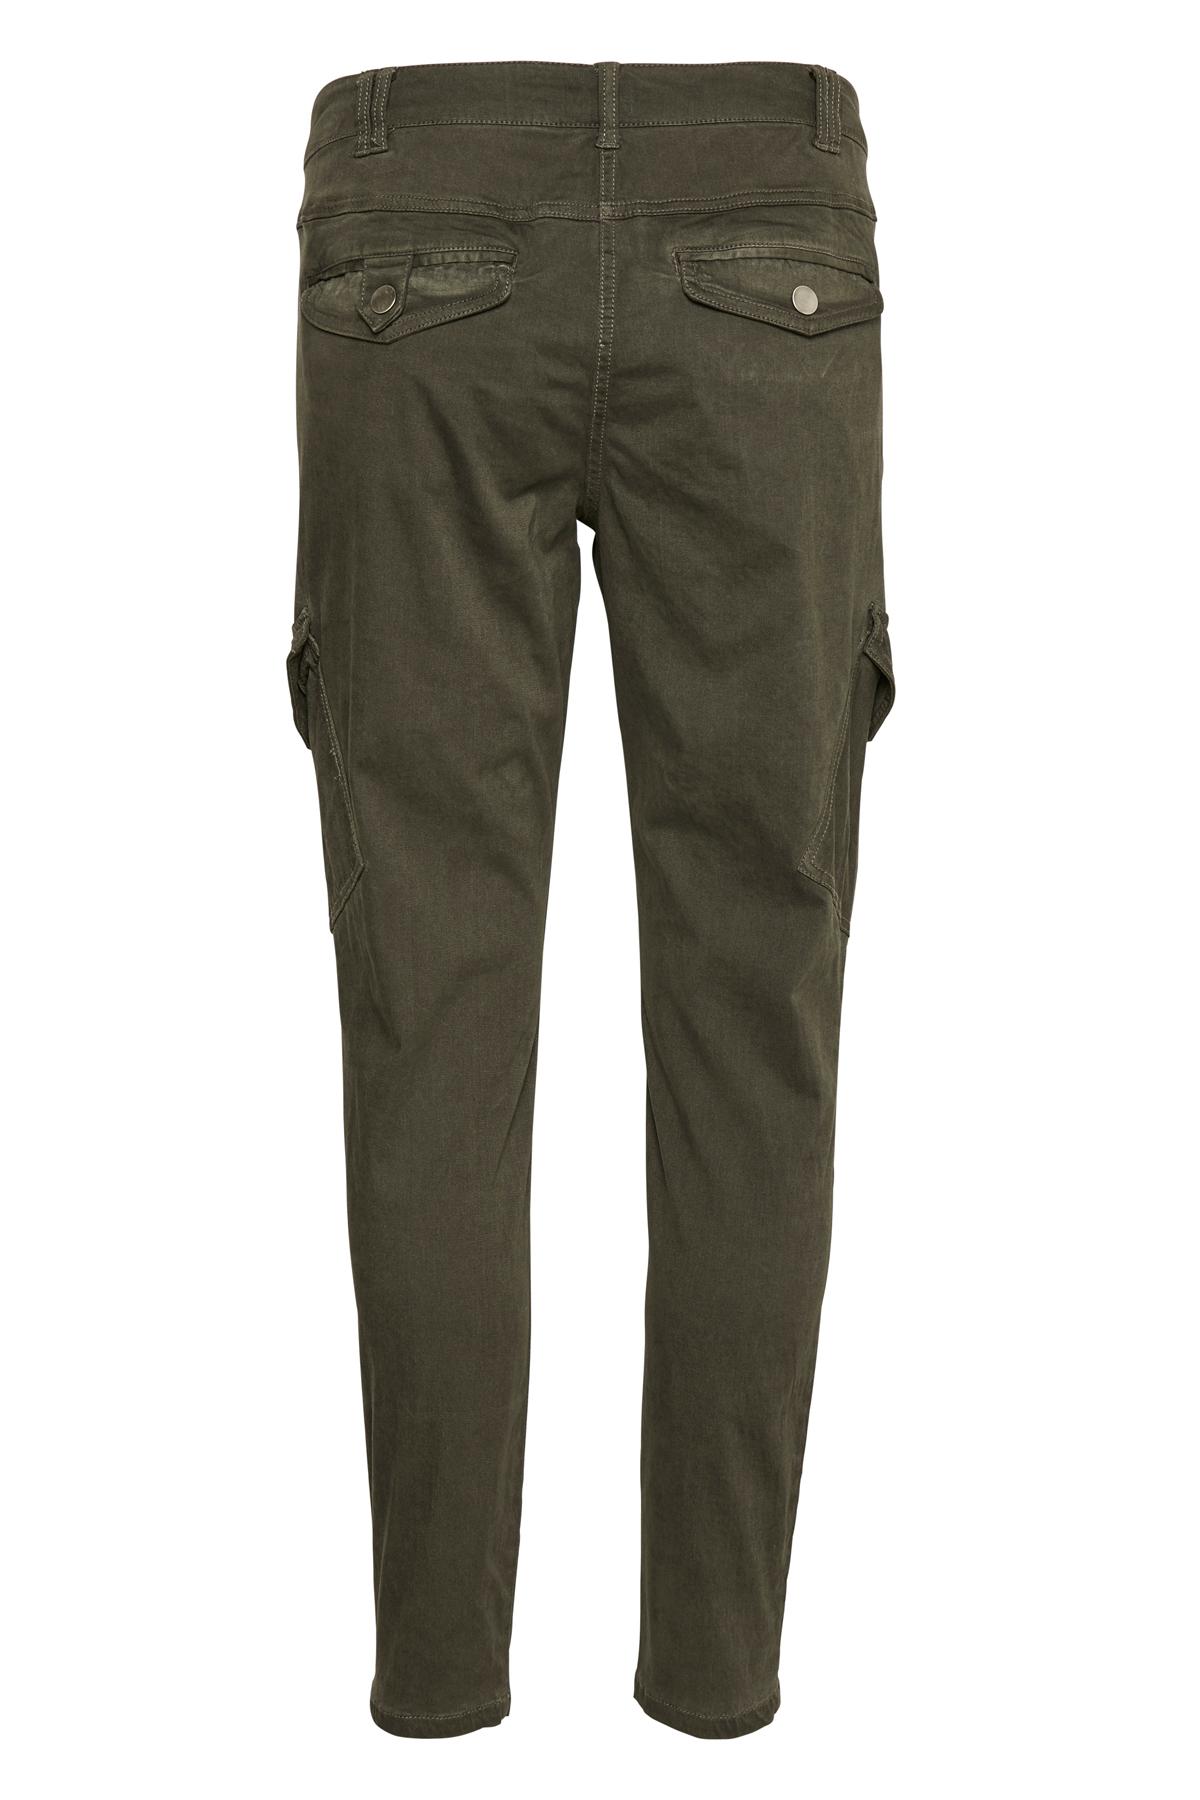 Army Casual bukser fra Bon'A Parte – Køb Army Casual bukser fra str. 36-48 her